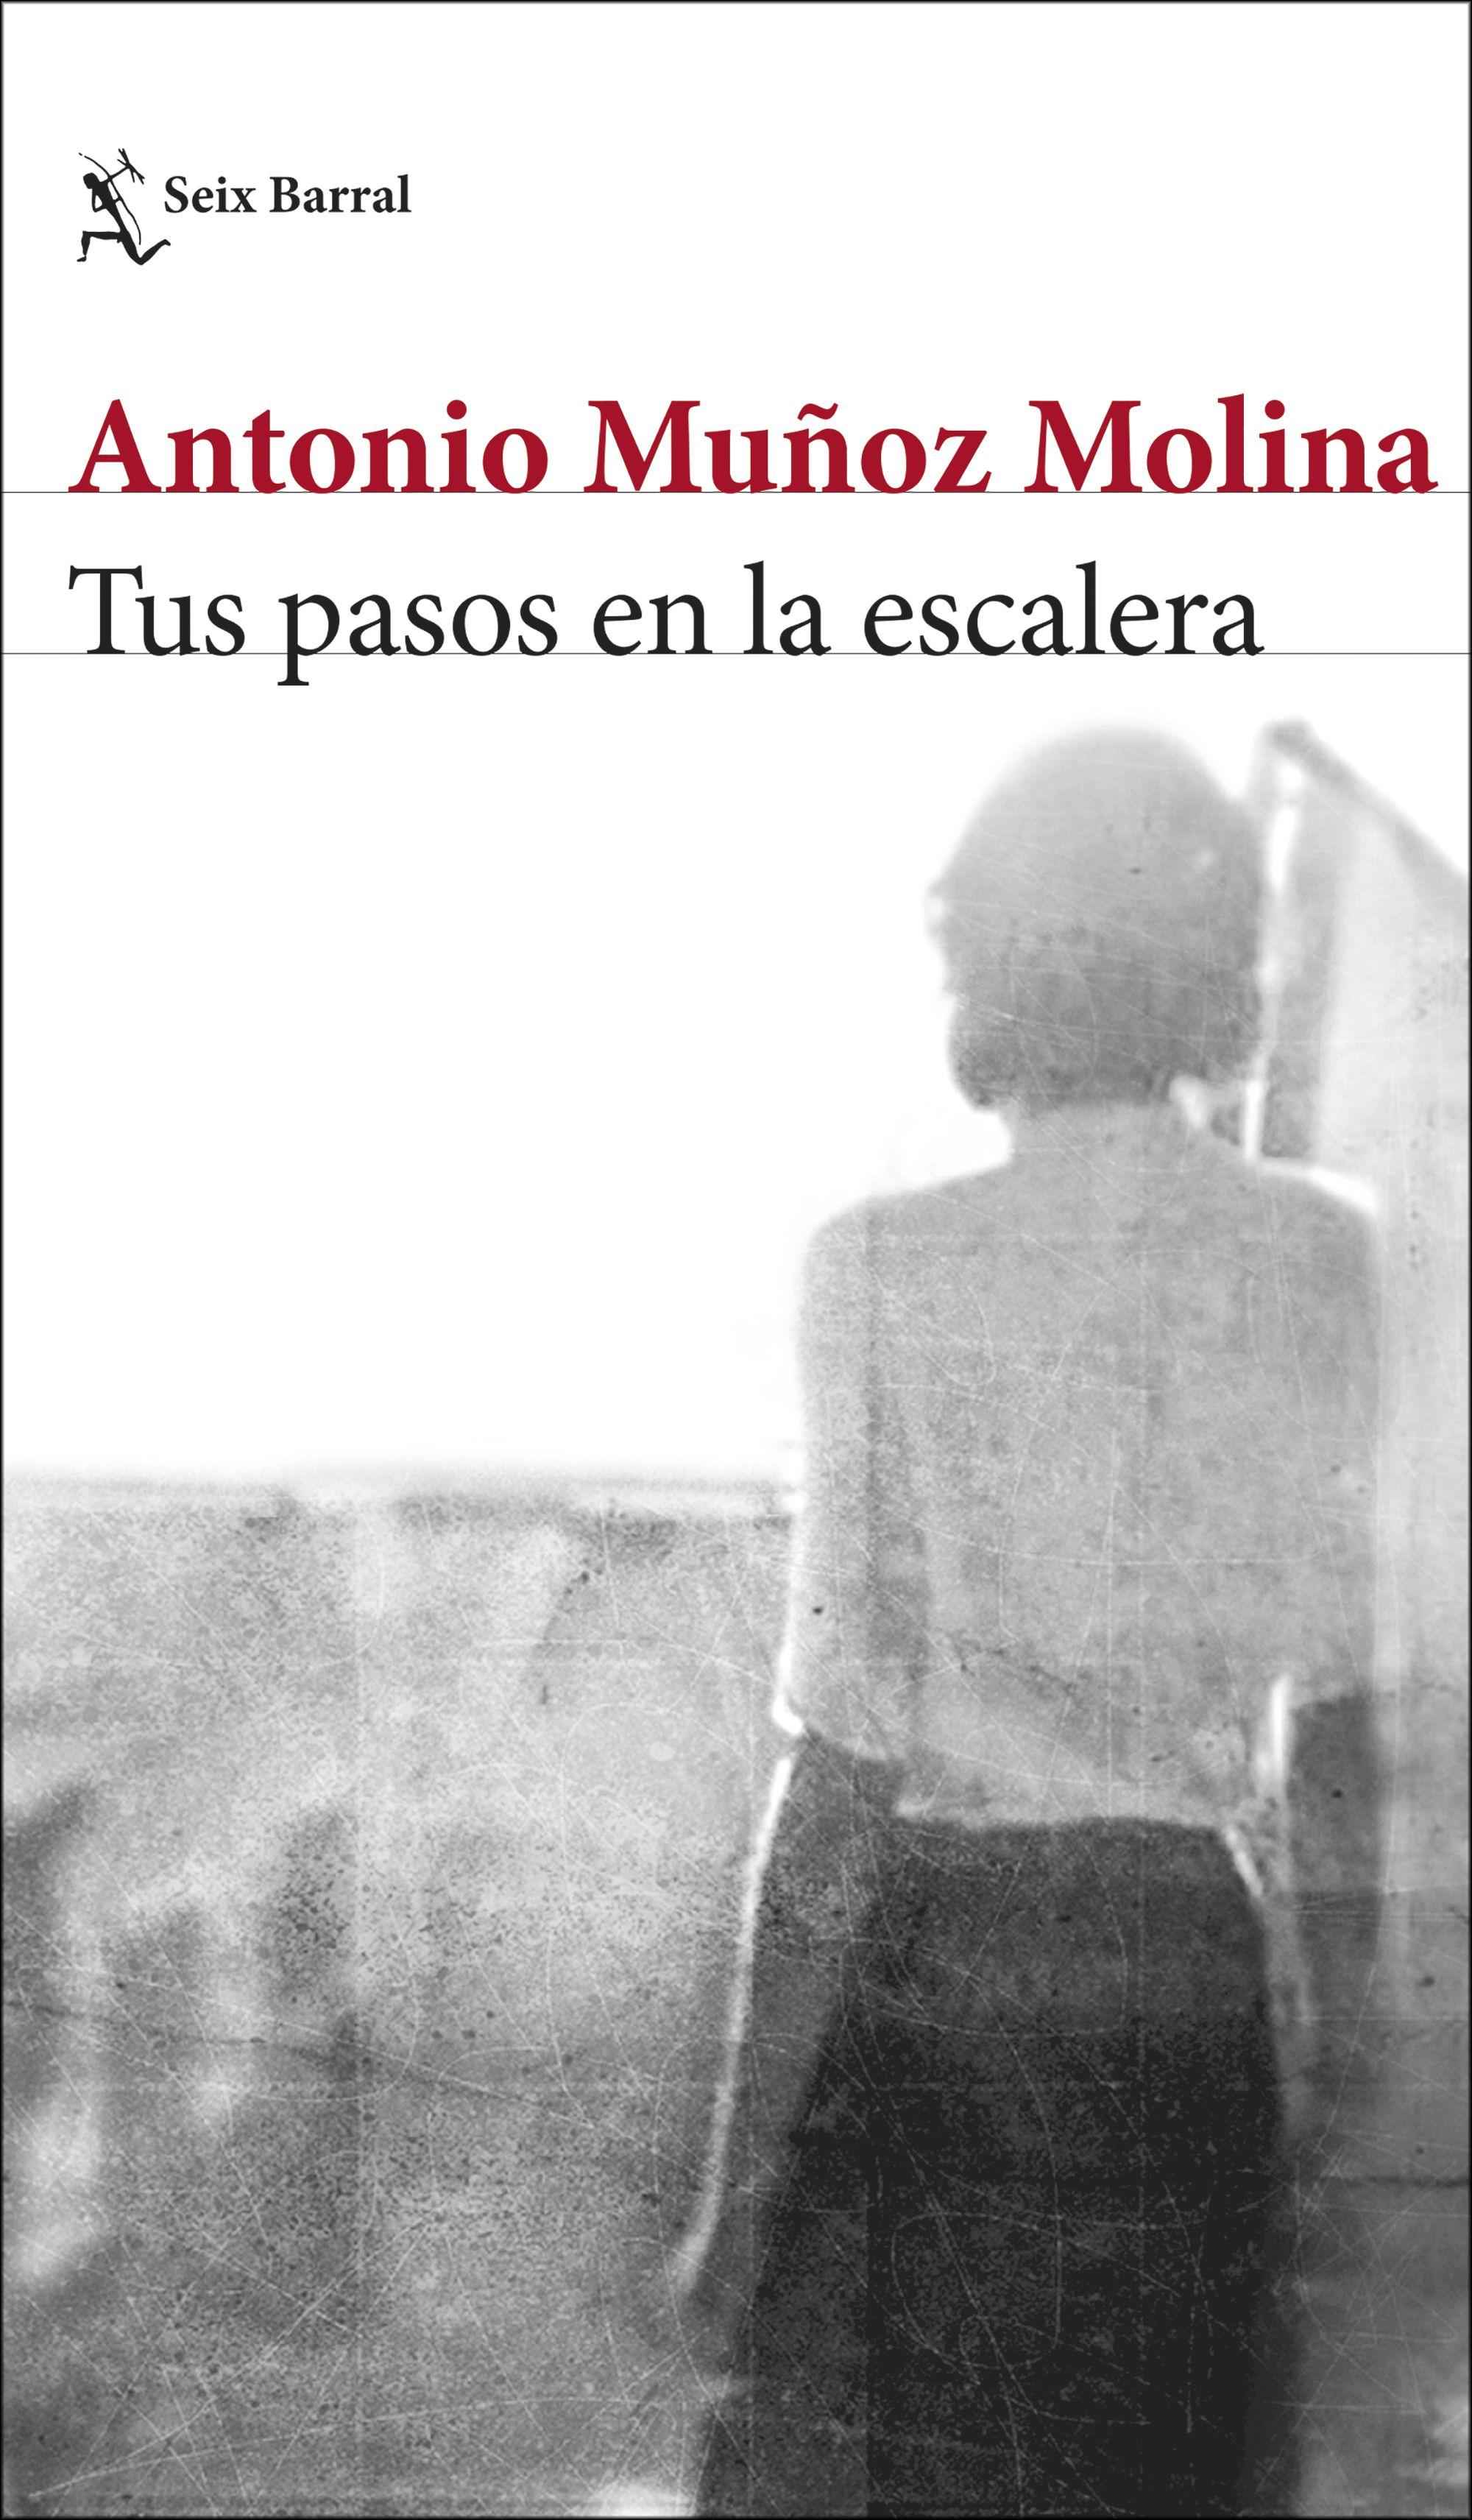 TUS PASOS EN LA ESCALERA, de Antonio Muñoz Molina Portada_tus-pasos-en-la-escalera_antonio-munoz-molina_201902151524